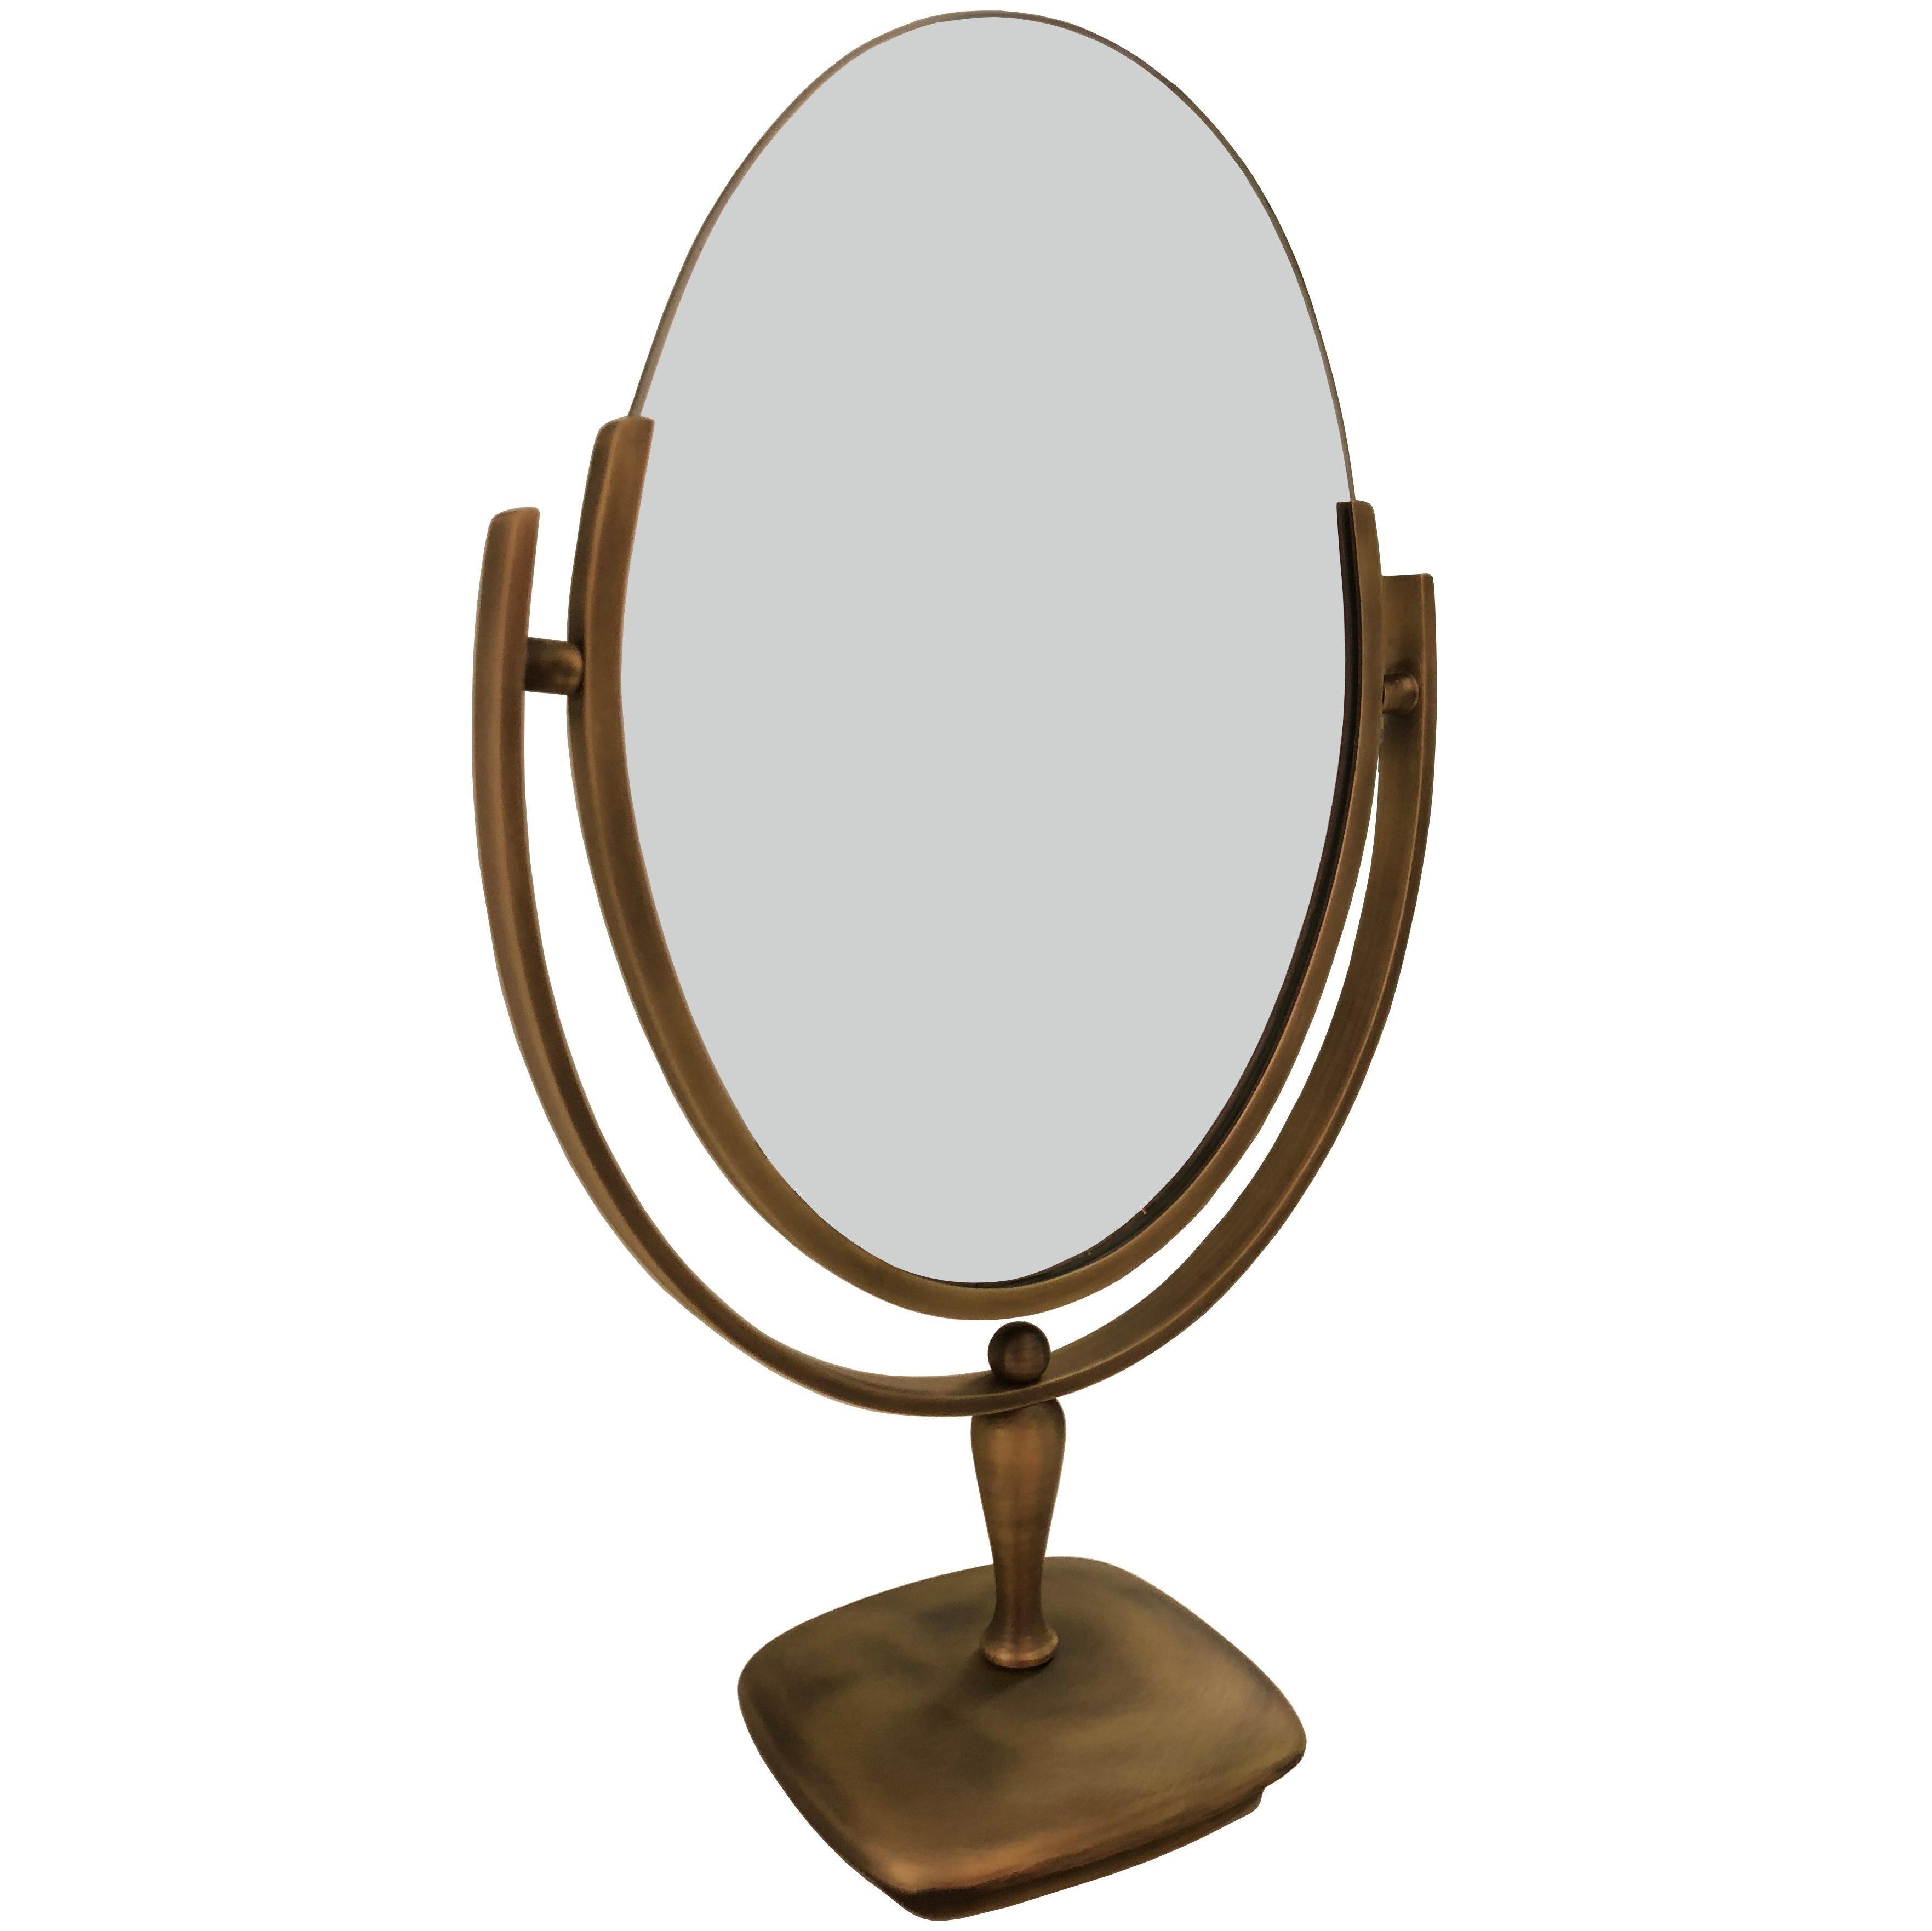 Antique Brass Vanity Mirror by Charles Hollis Jones